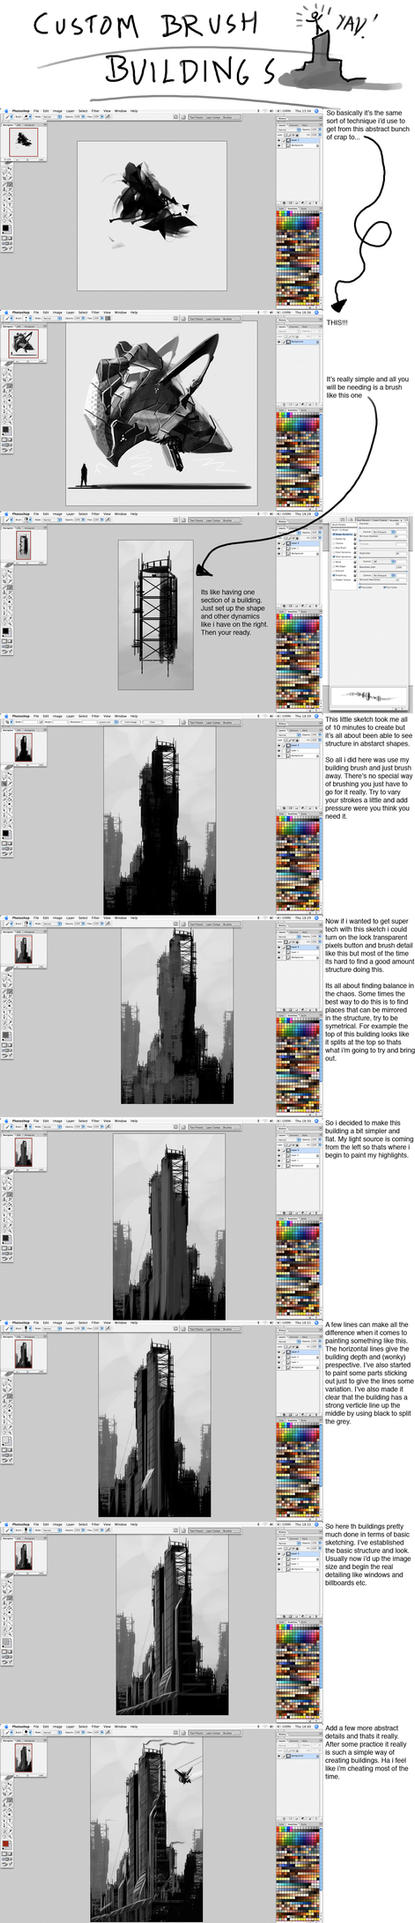 .:Building Tutorial:. by David-Holland